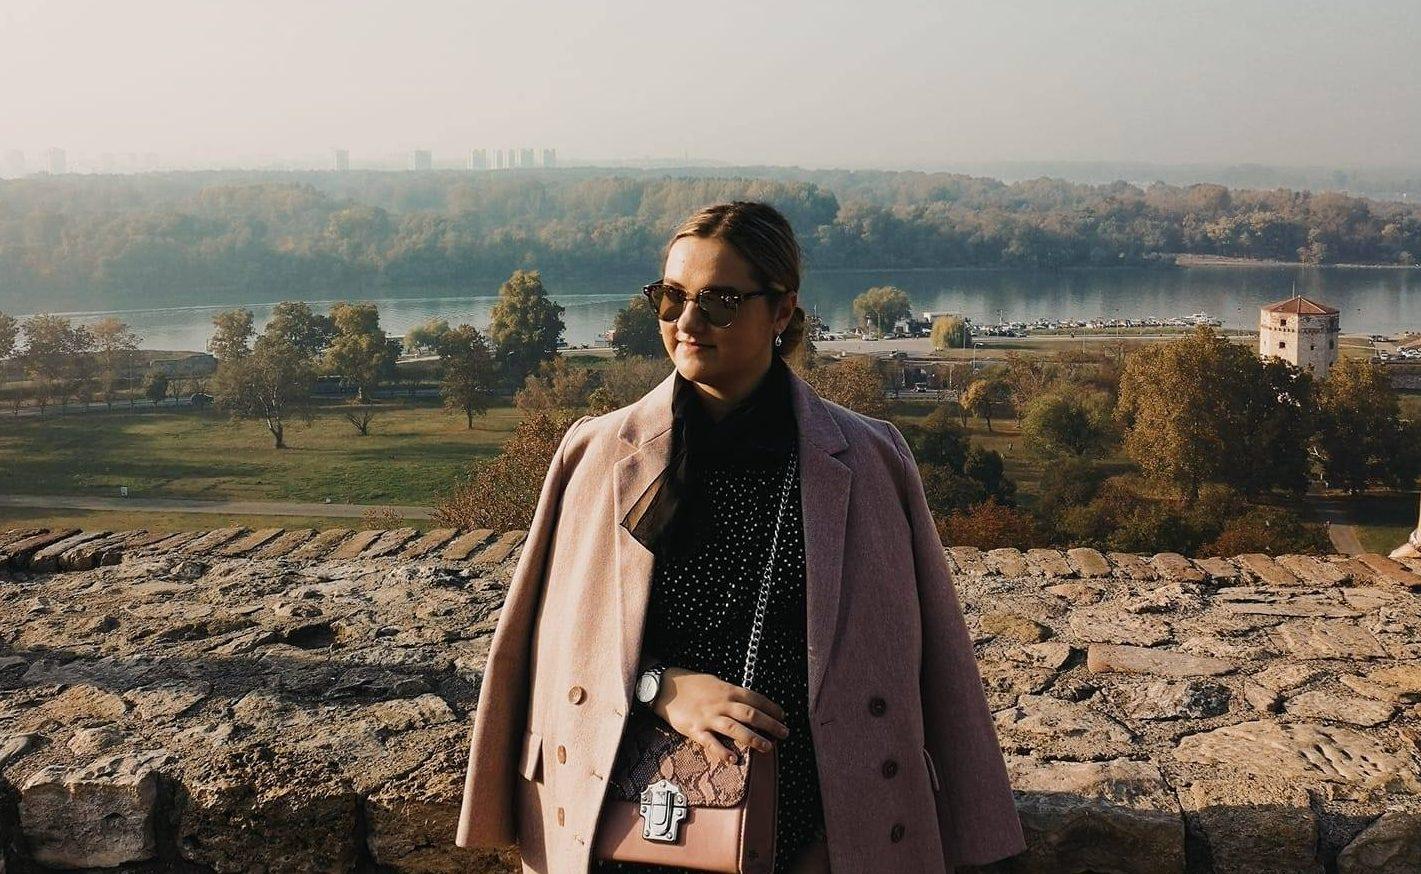 Maida Dubica: Pismo tebi